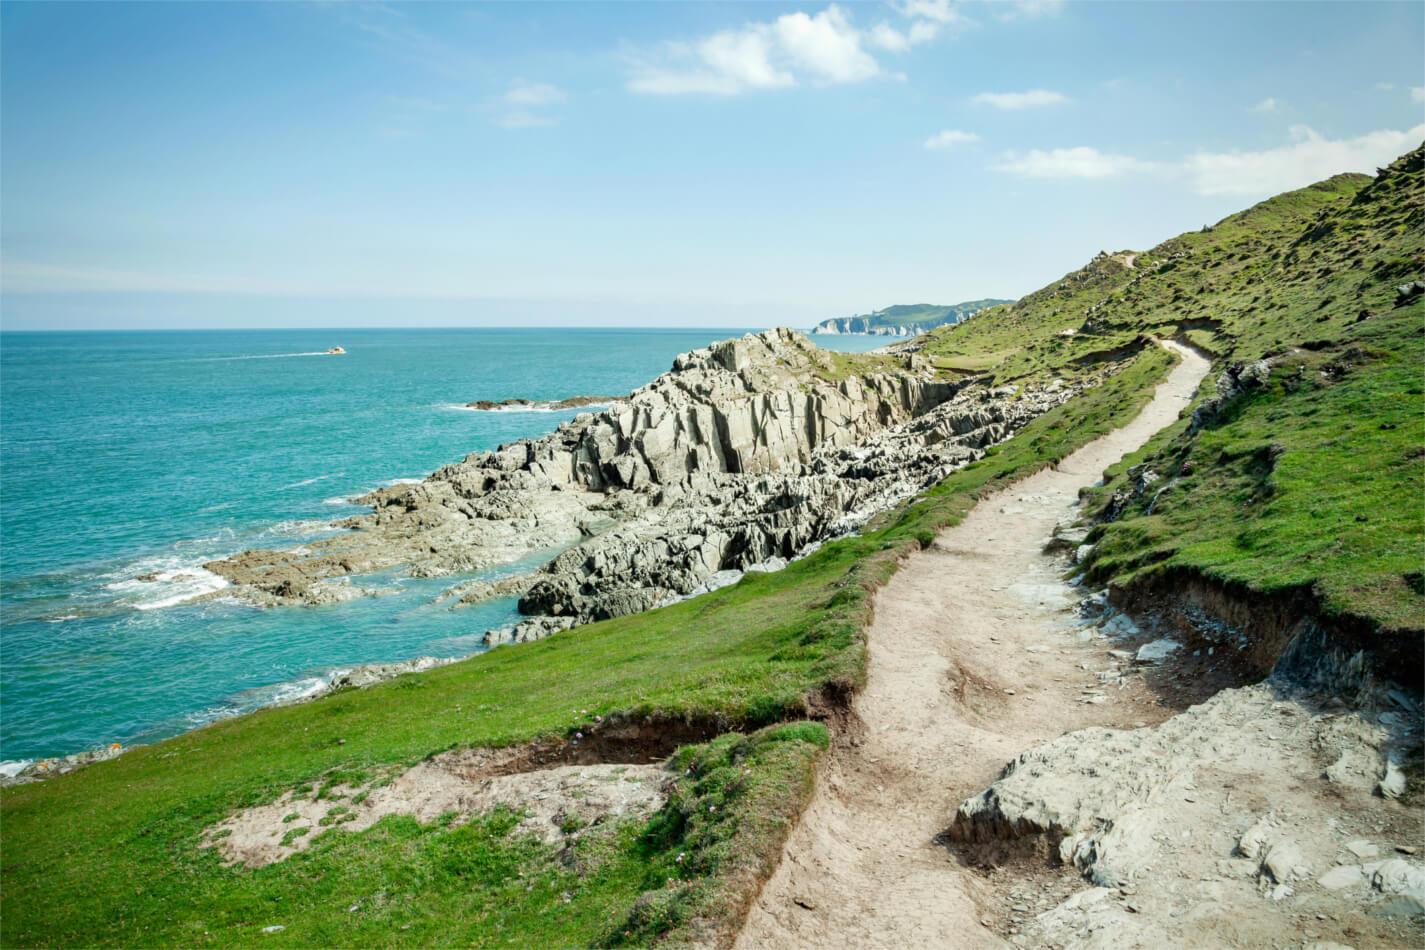 Walking path along Devon coast